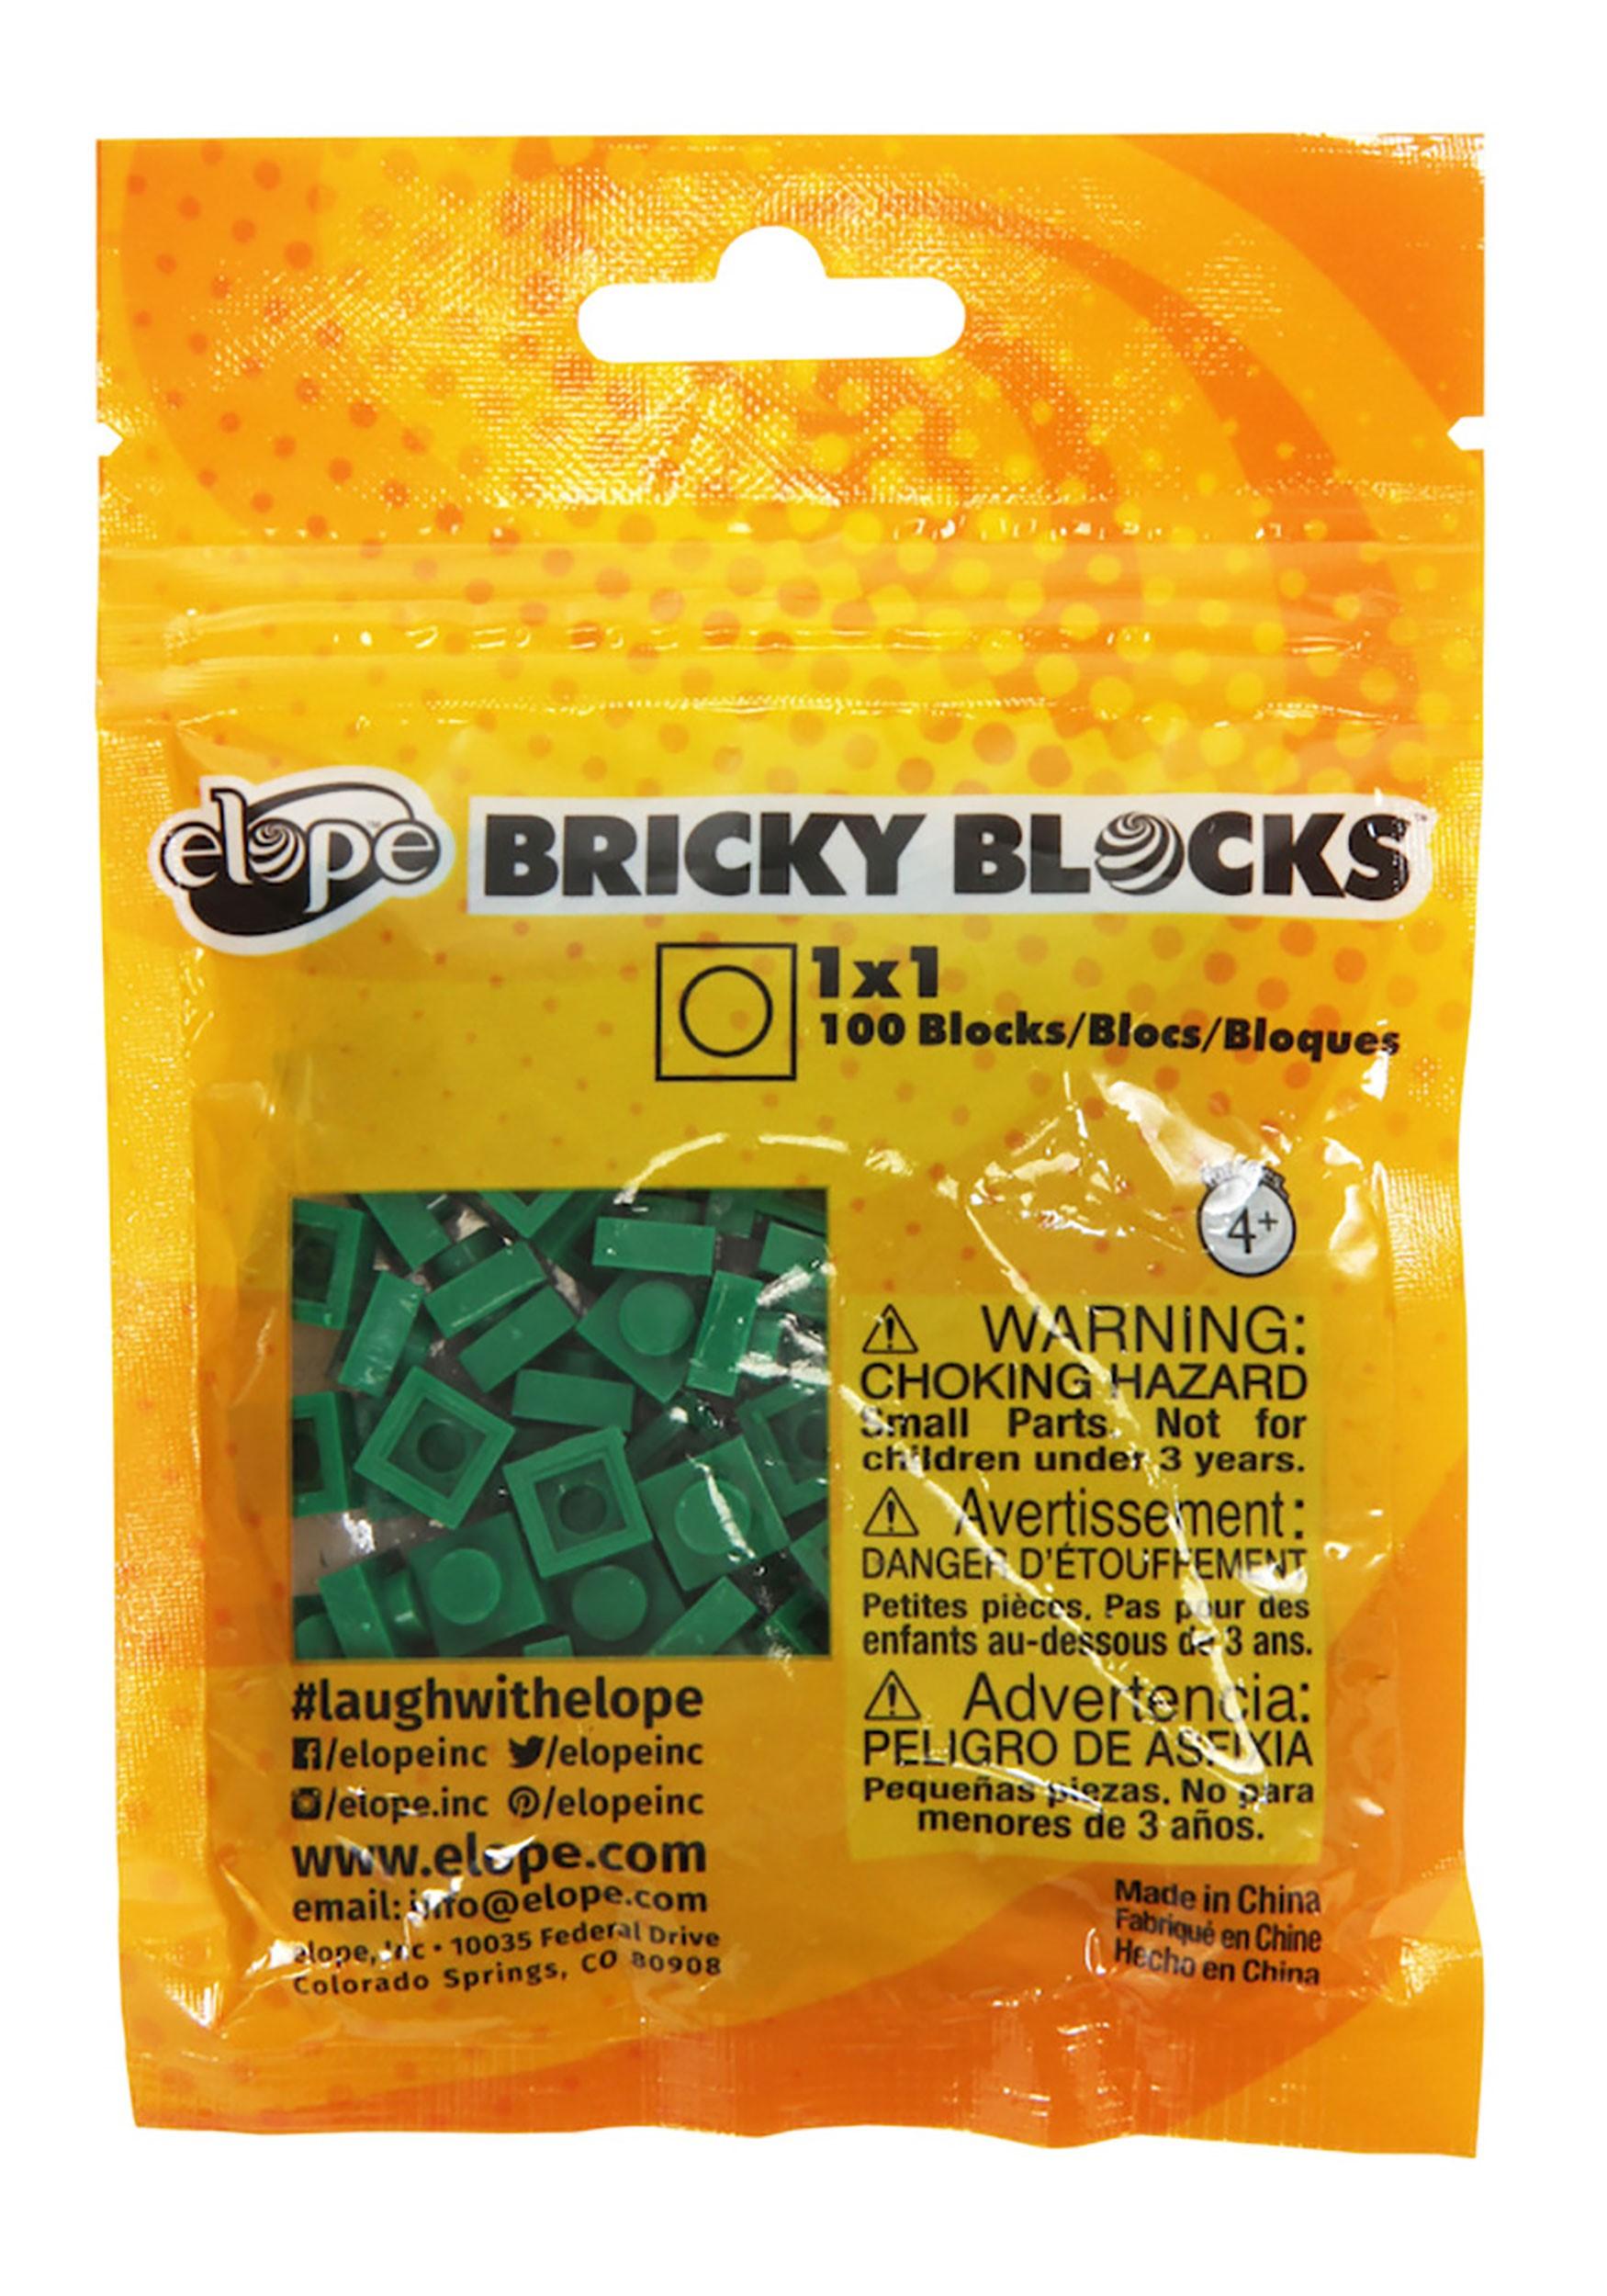 Green Bricky Blocks 100 Pieces 1x1